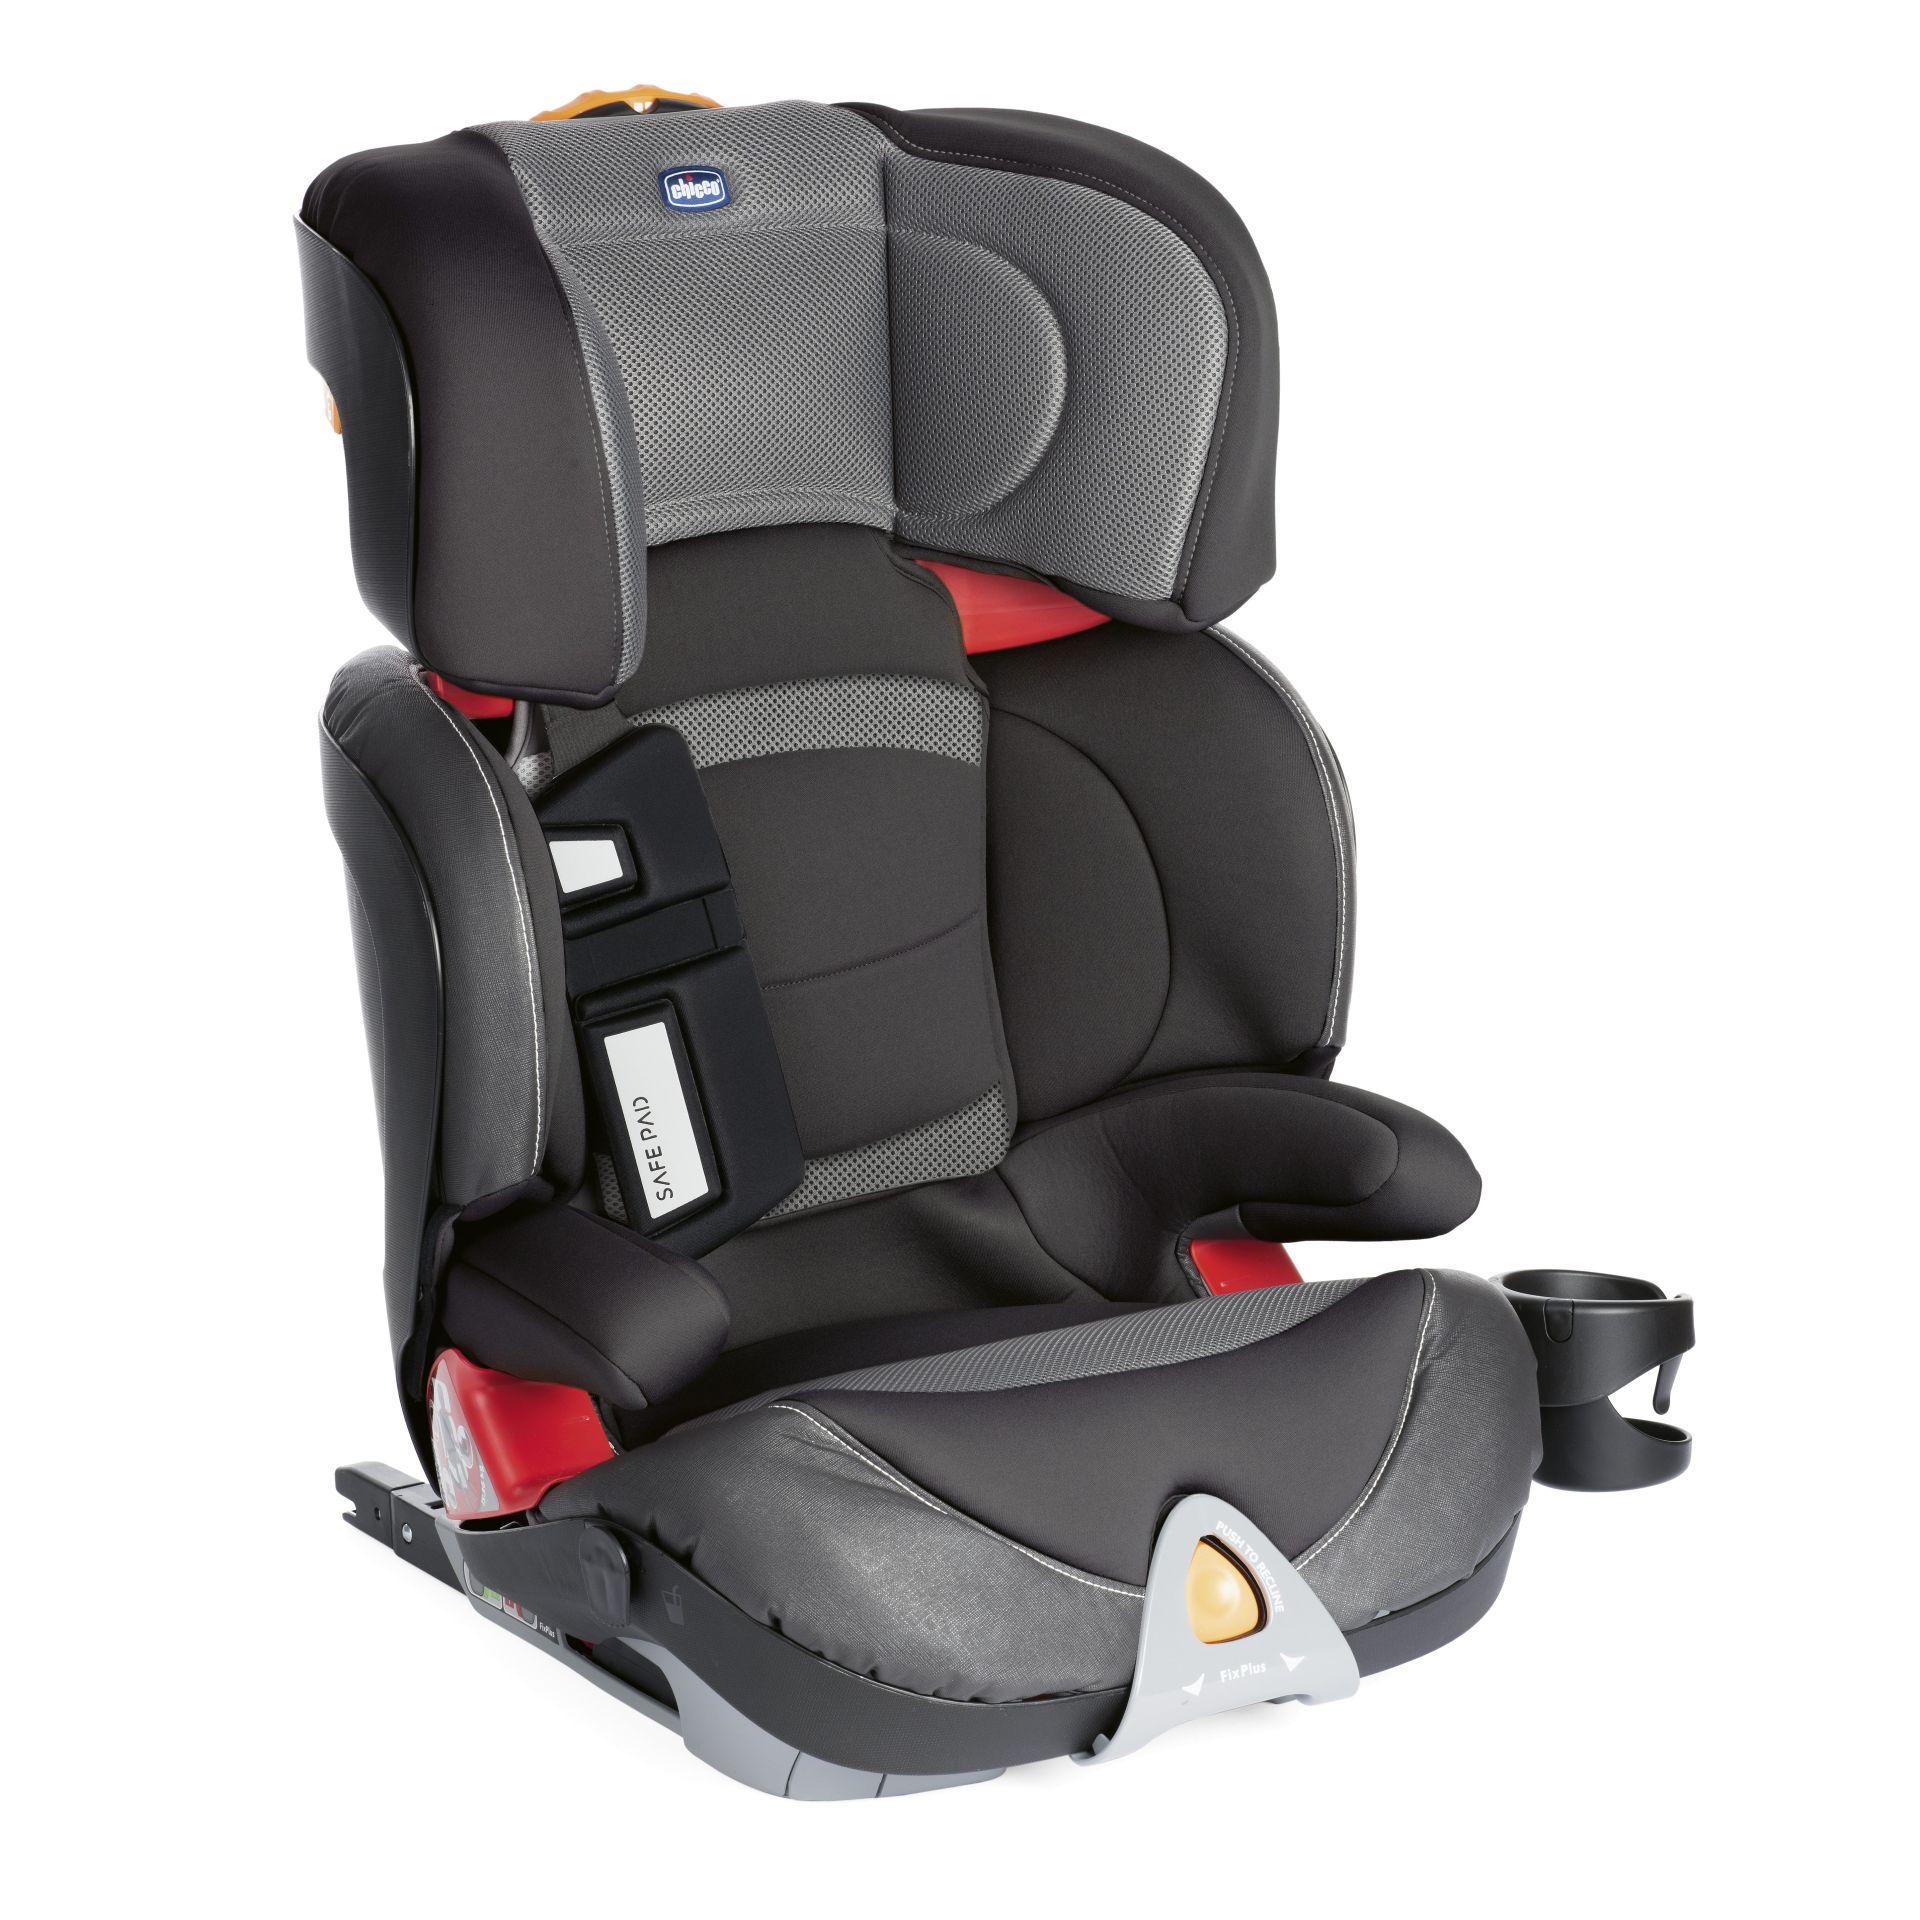 Chicco Child Car Seat Oasys 2-3 Evo FixPlus 2018 Stone - Buy at ...